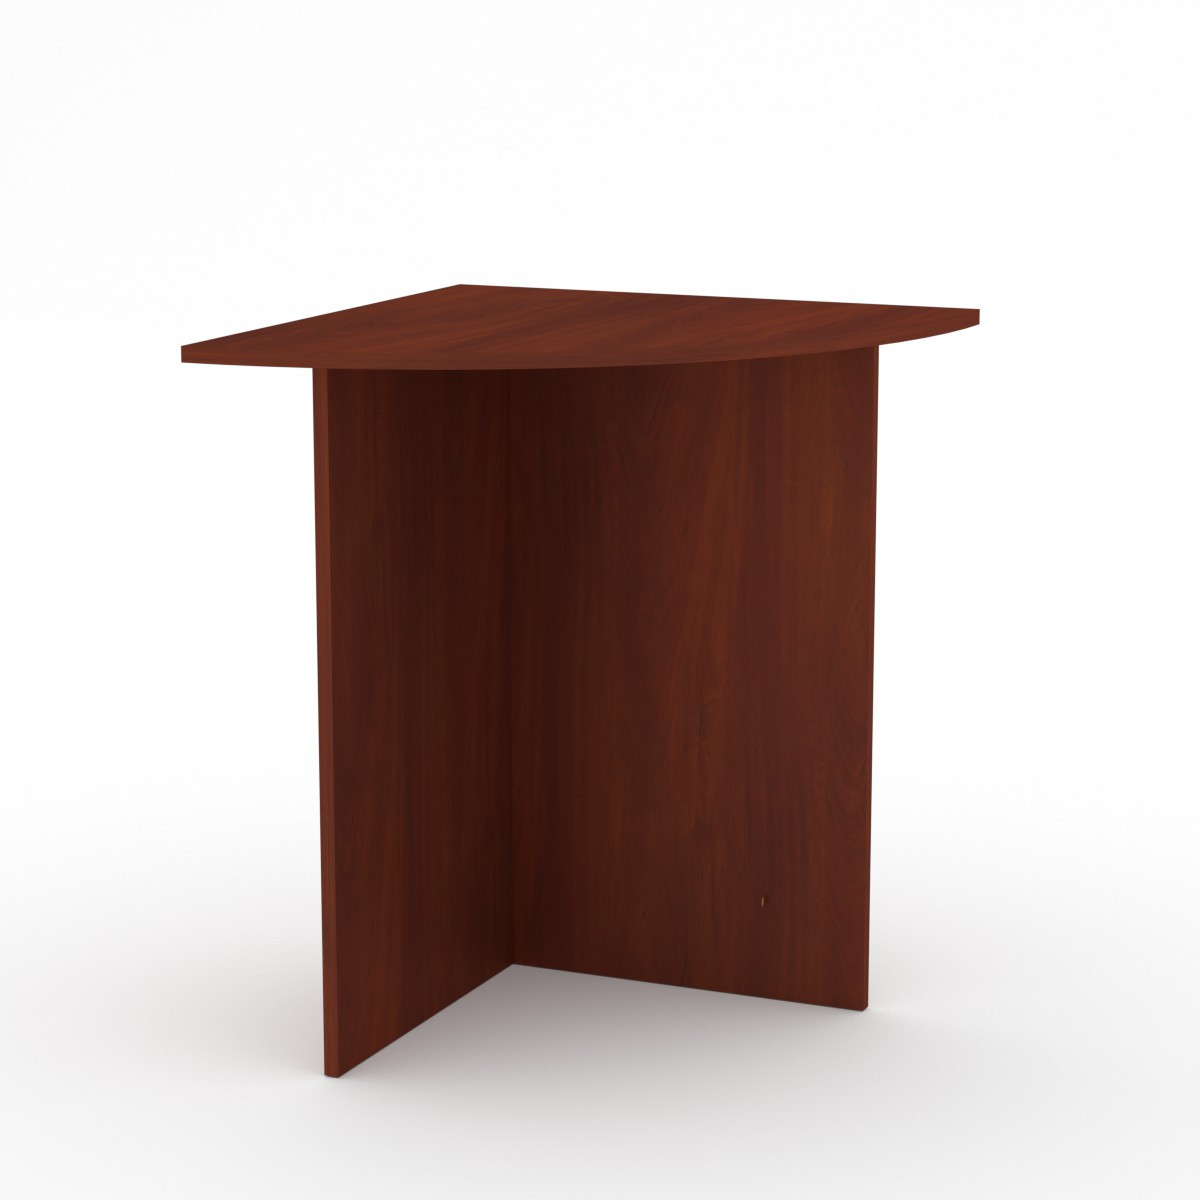 Письменный стол МО-2 АБС